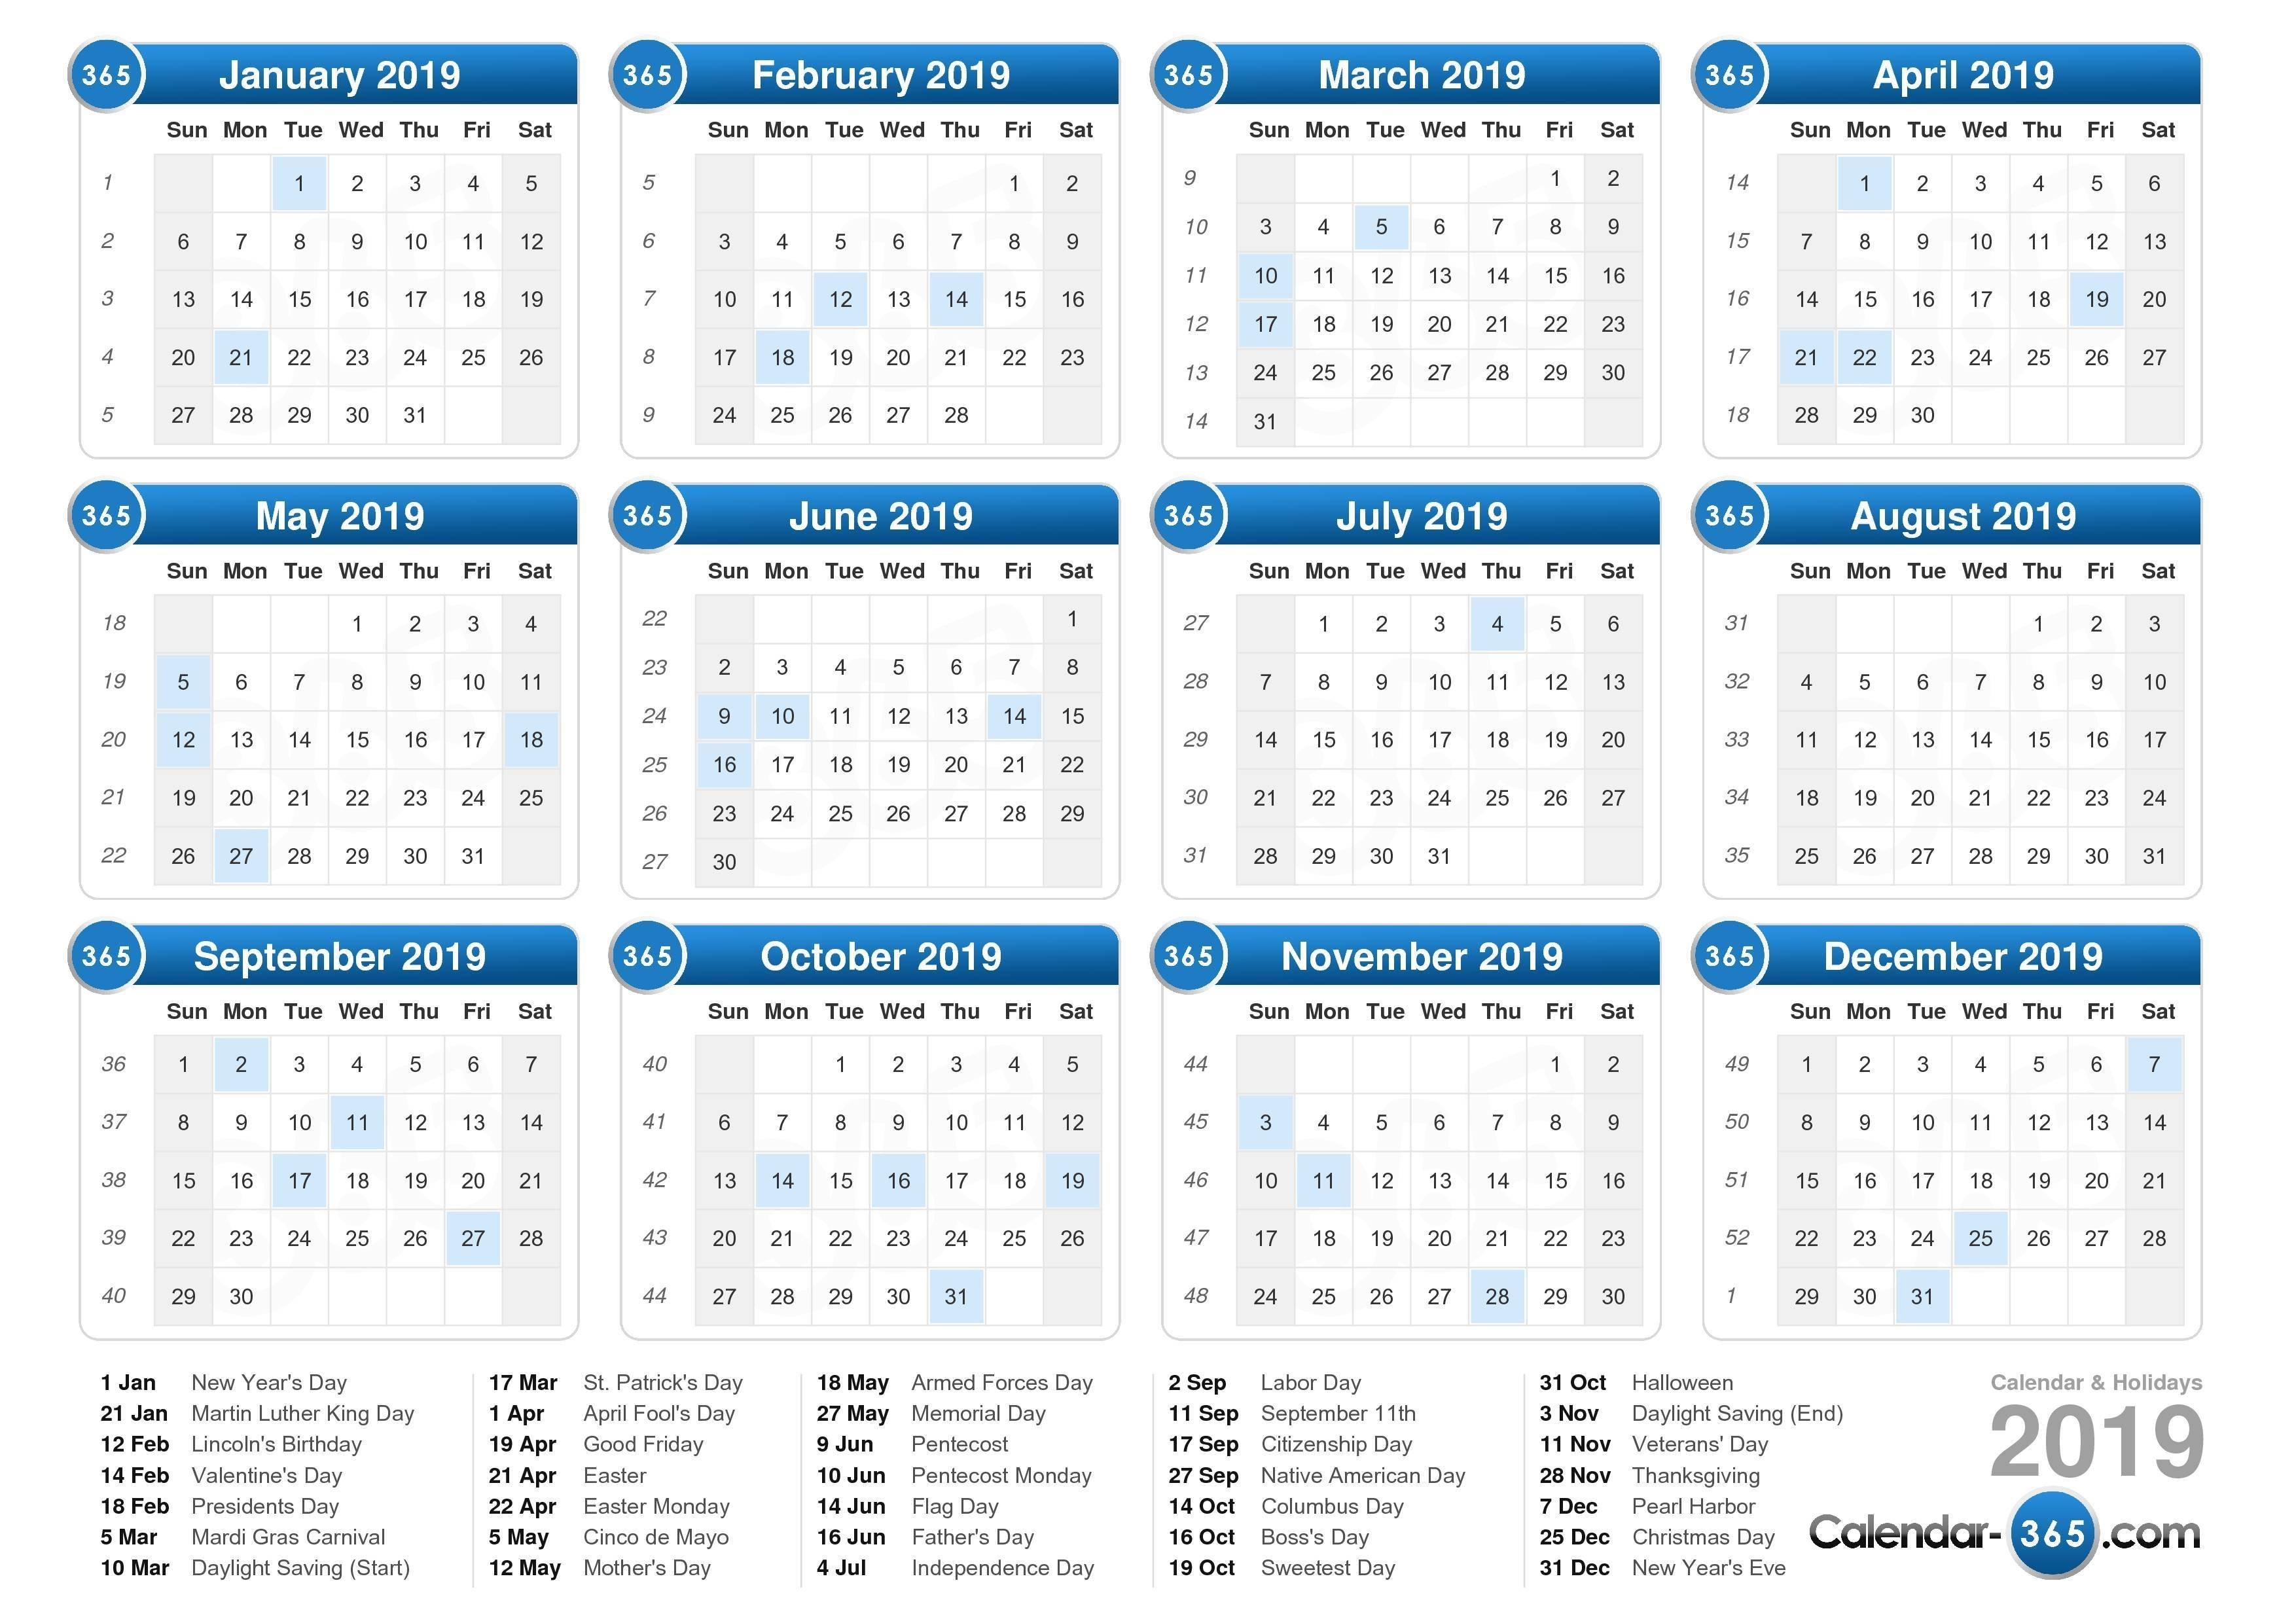 2019 Calendar Calendar 2019 With Holidays